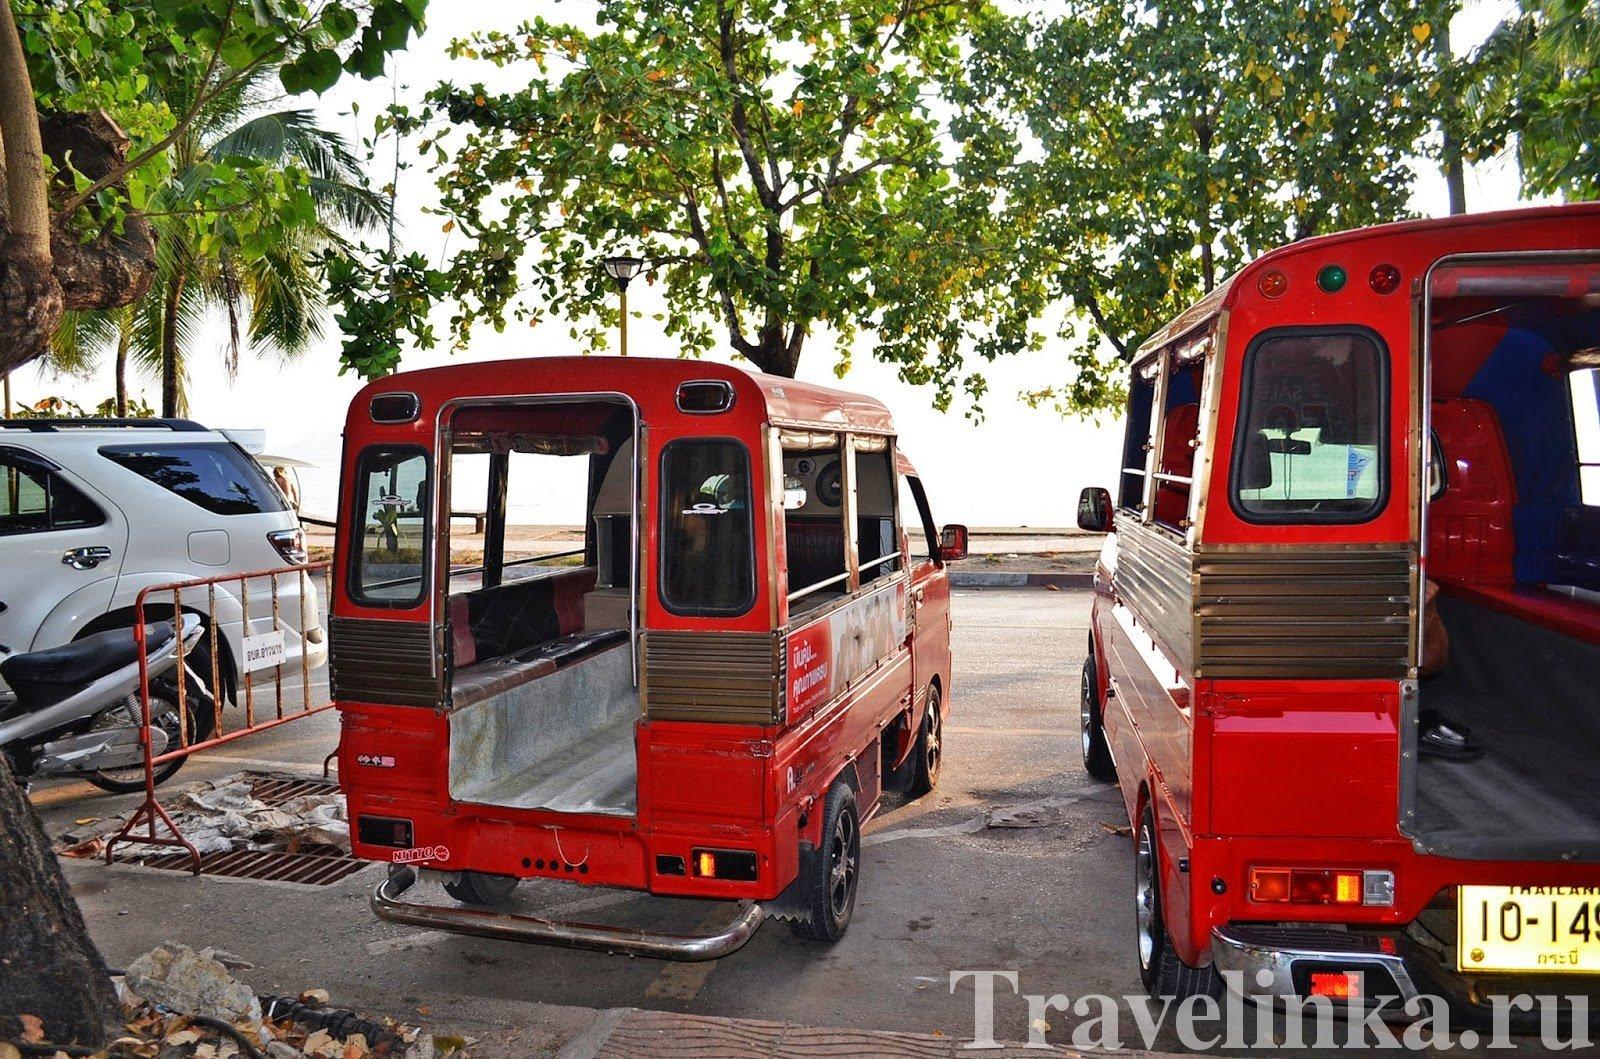 Транспорт в Таиланде - Сонгтео